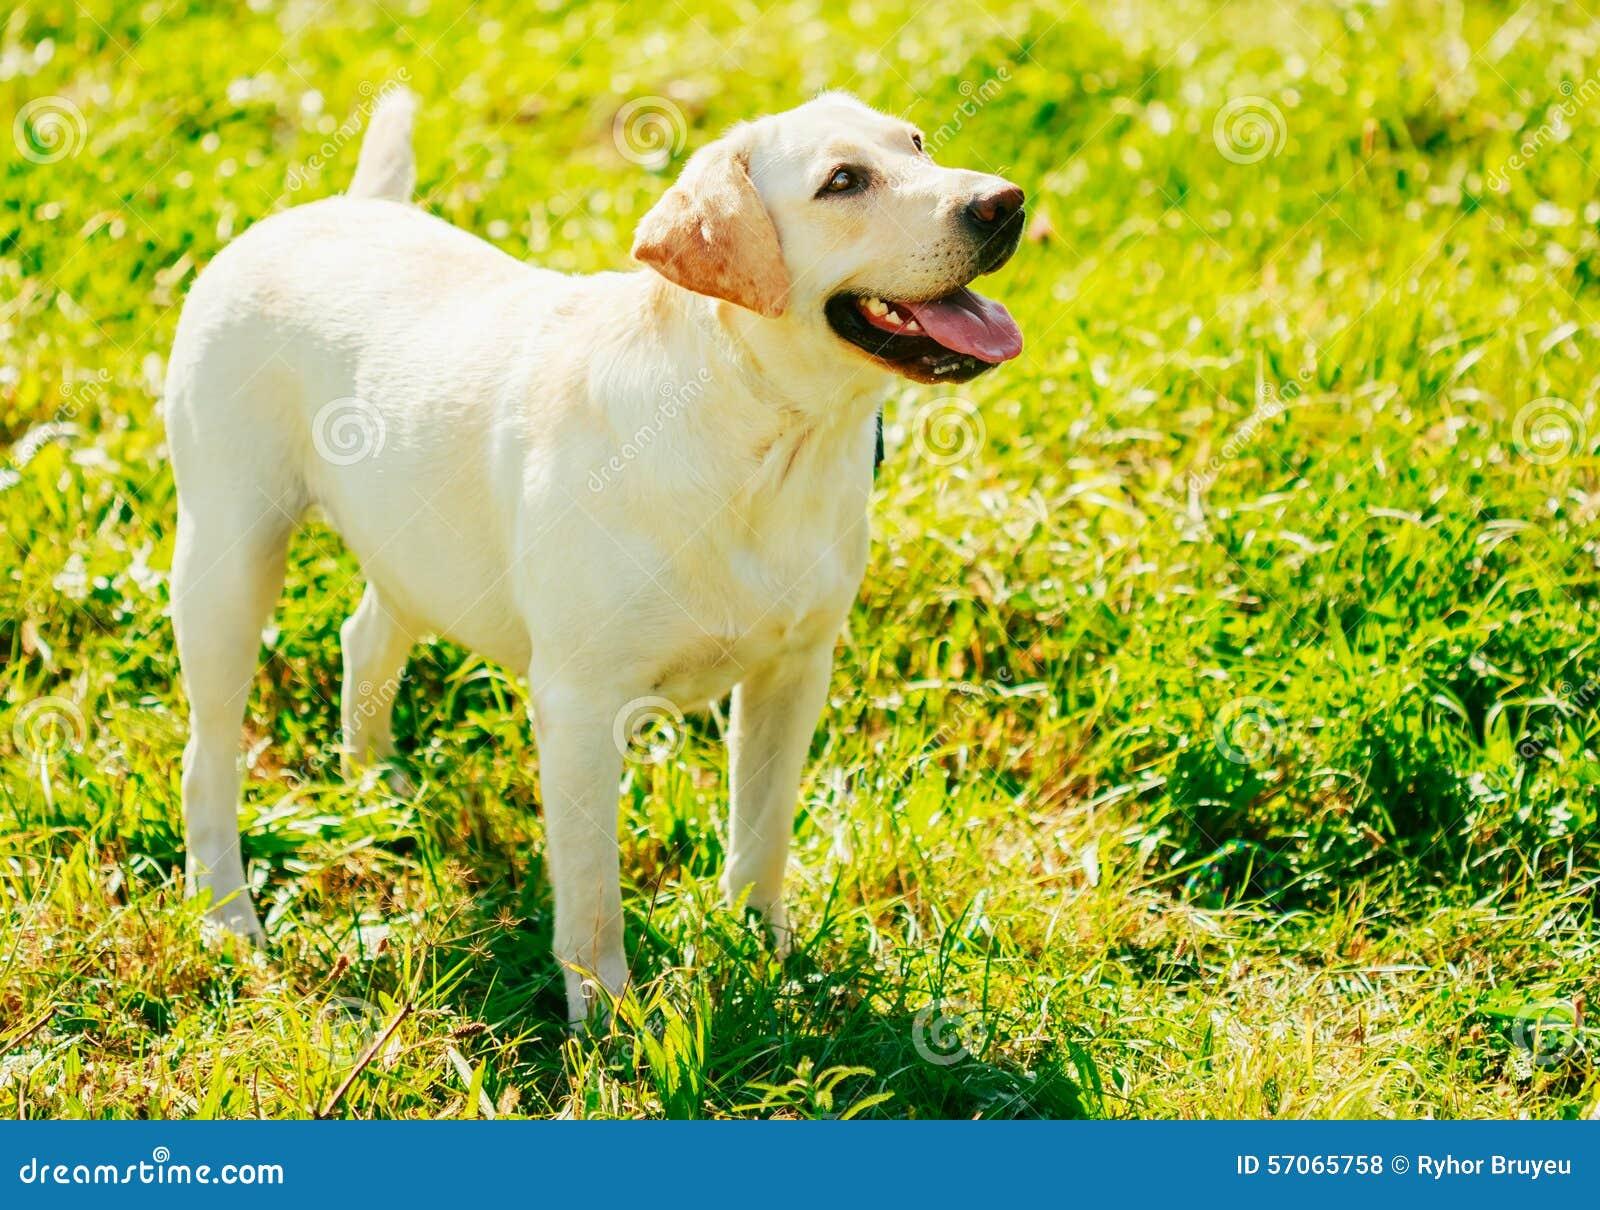 Witte Labradorhond die zich op Gras bevinden